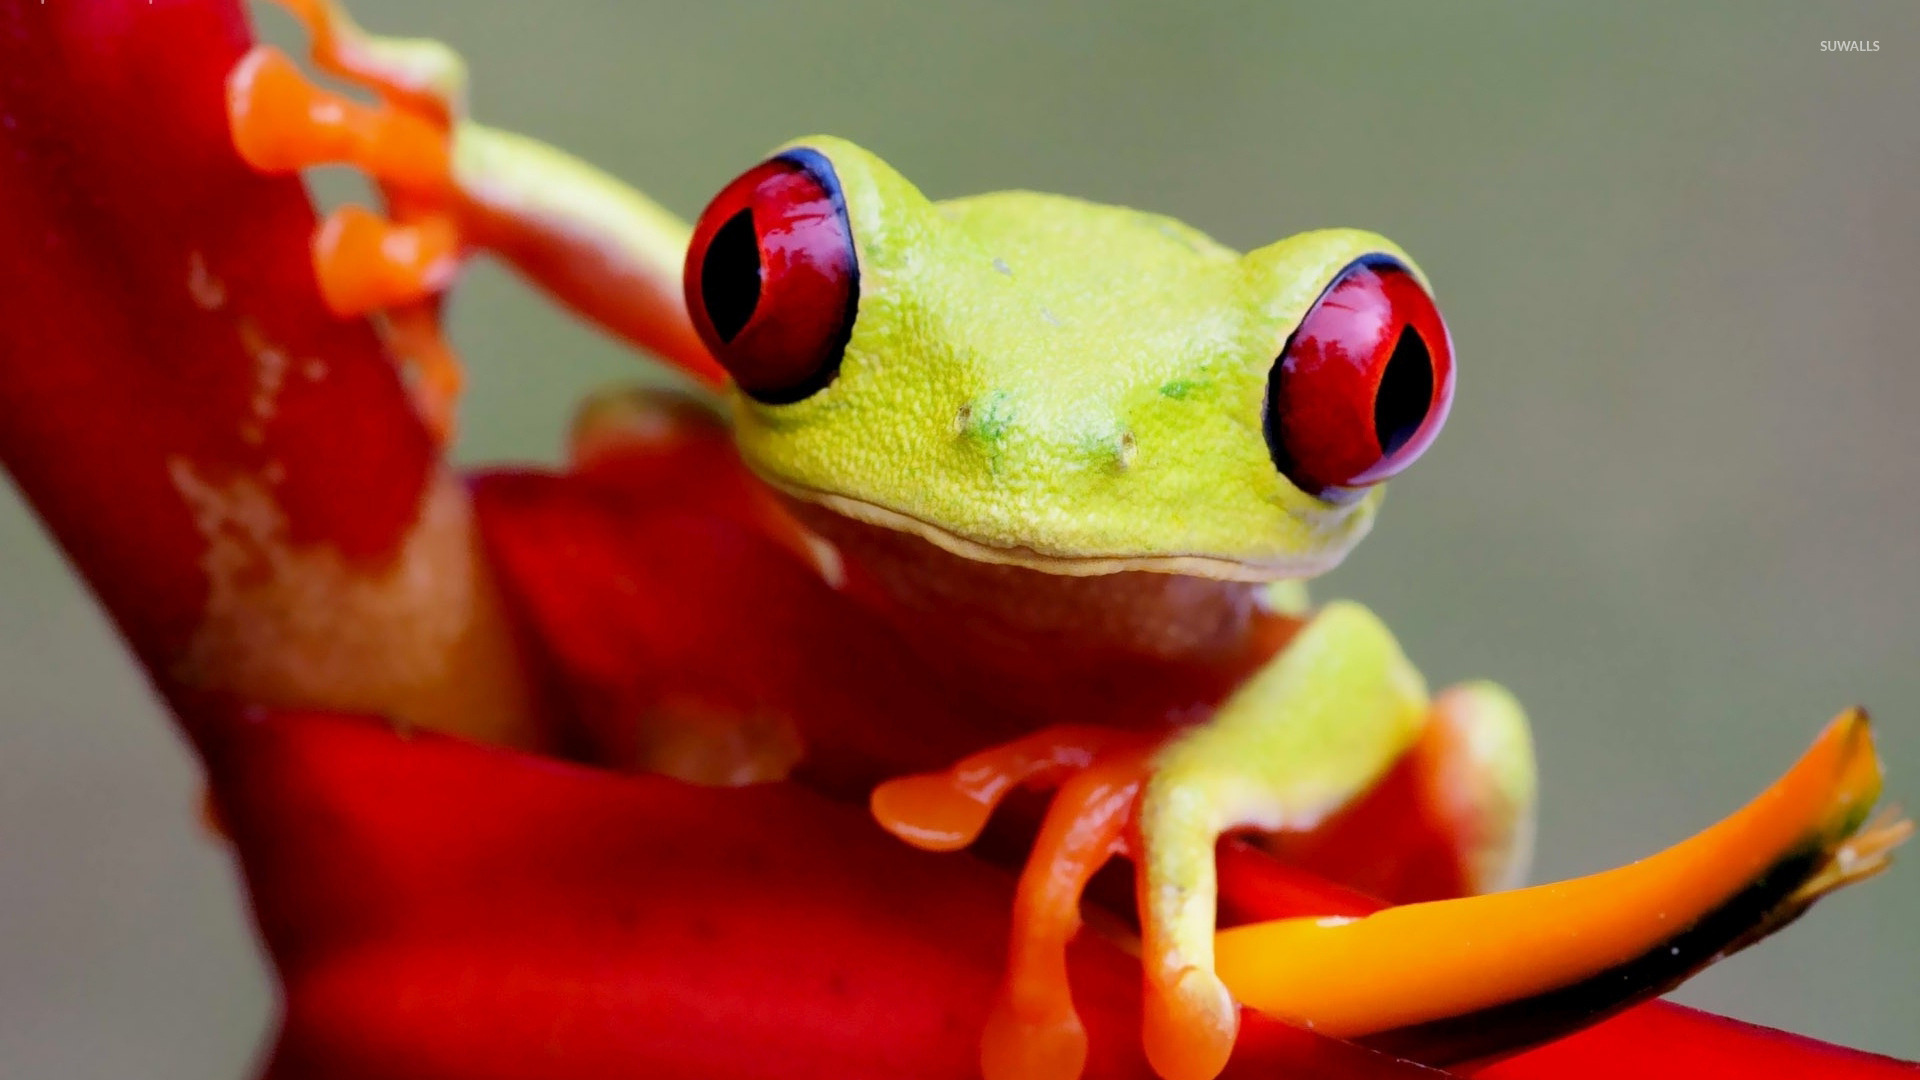 Tree Frog Wallpaper HD Wallpapers Download Free Images Wallpaper [1000image.com]